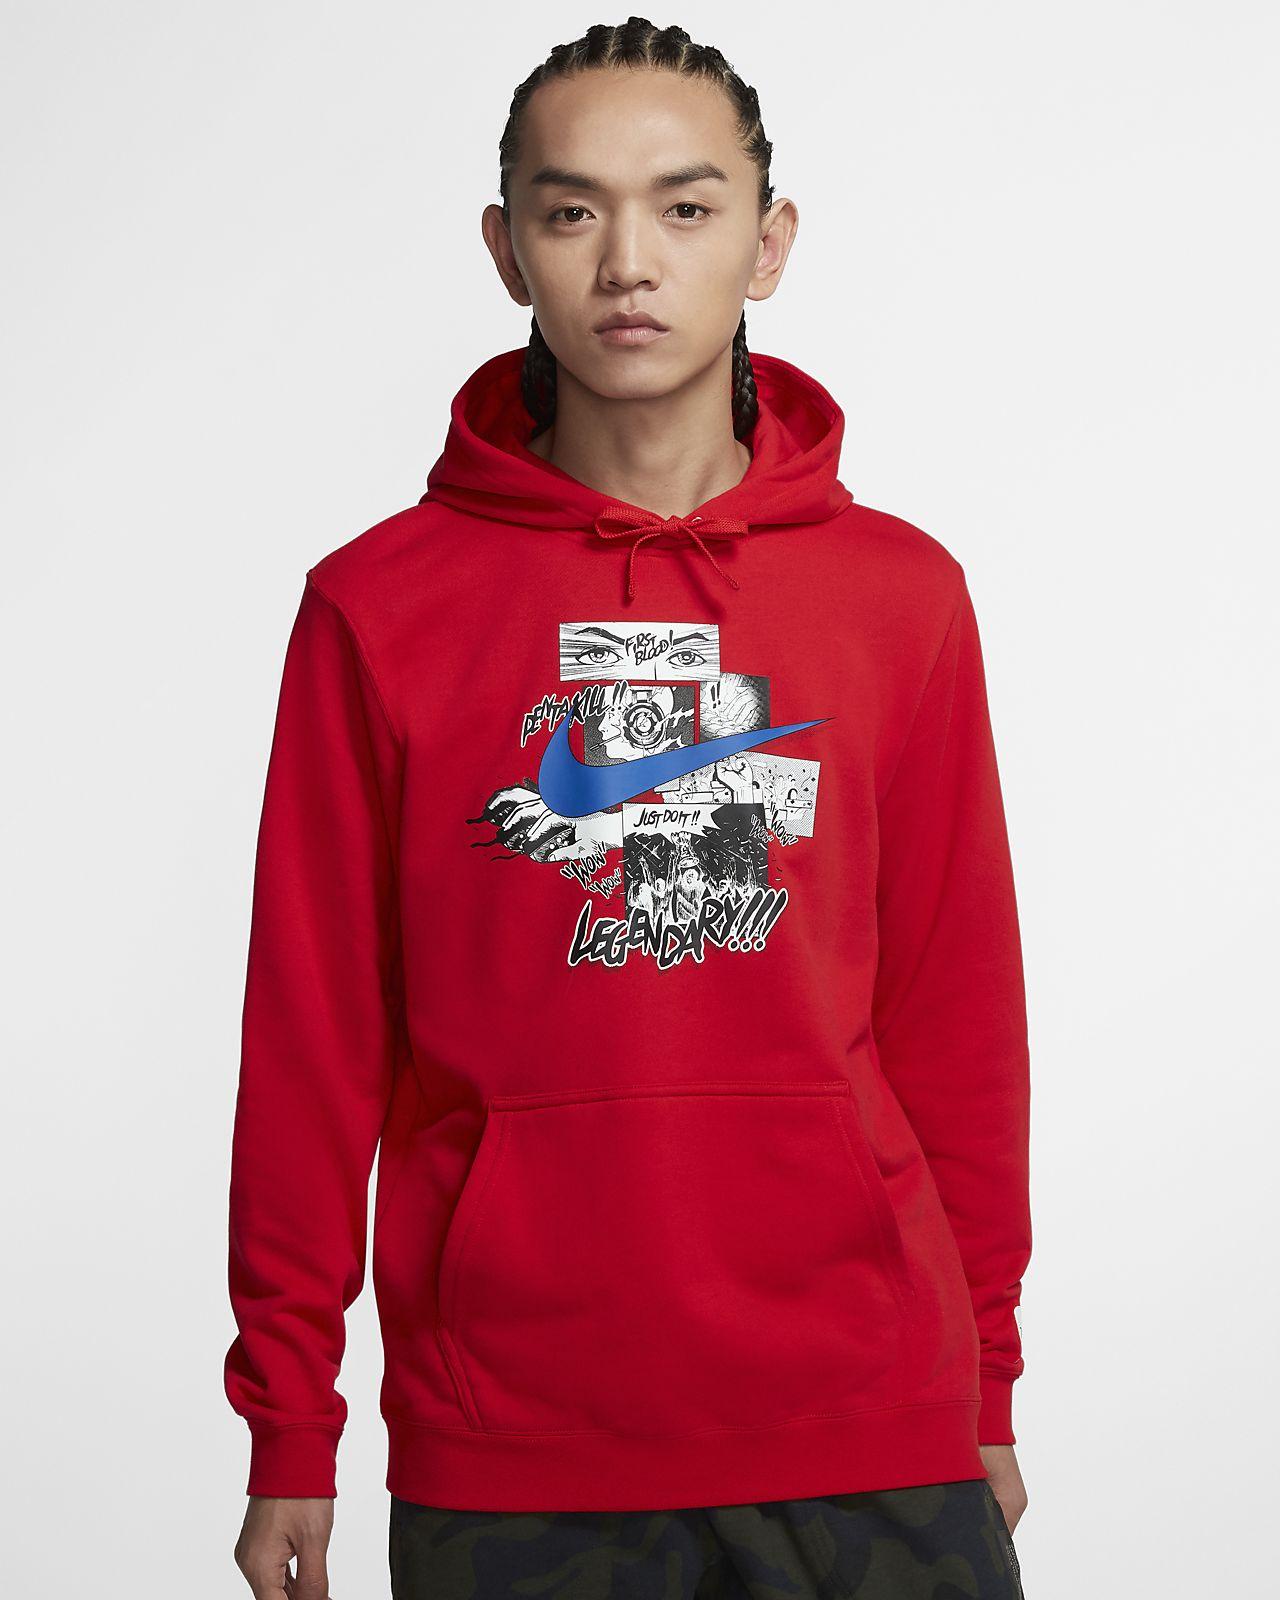 Nike X LPL 召唤师玩家男子套头连帽衫